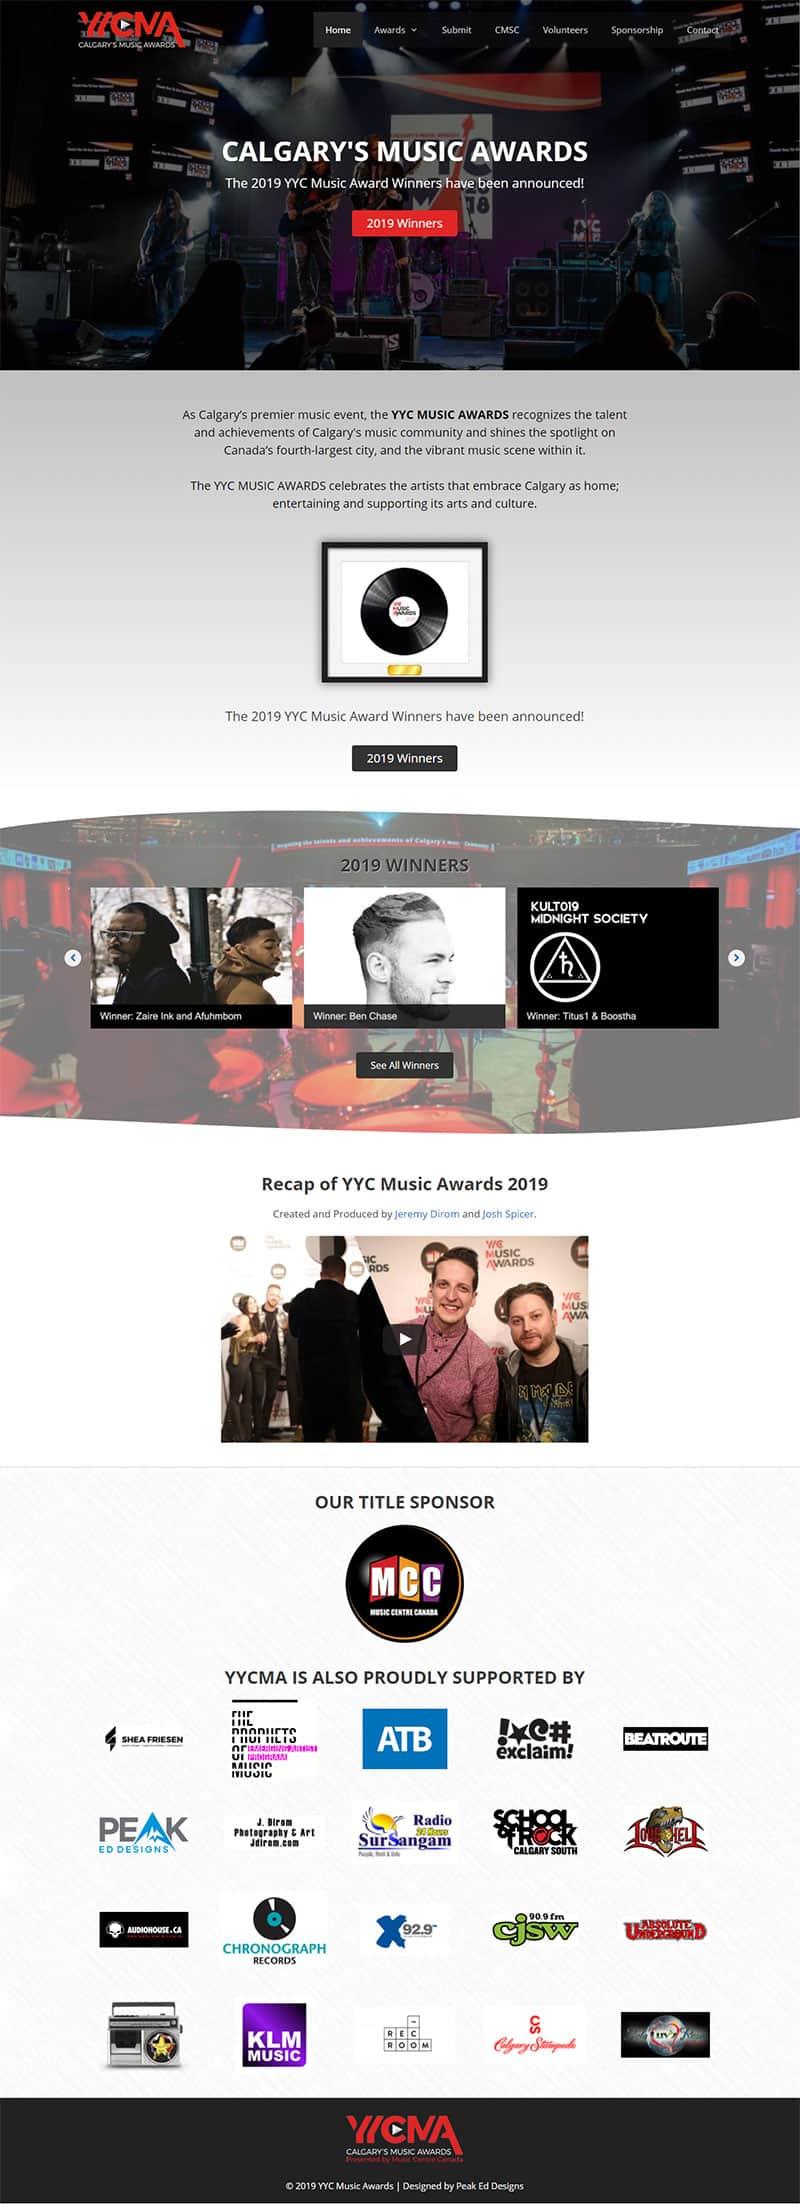 2019 YYC Music Awards Screenshot - After the update